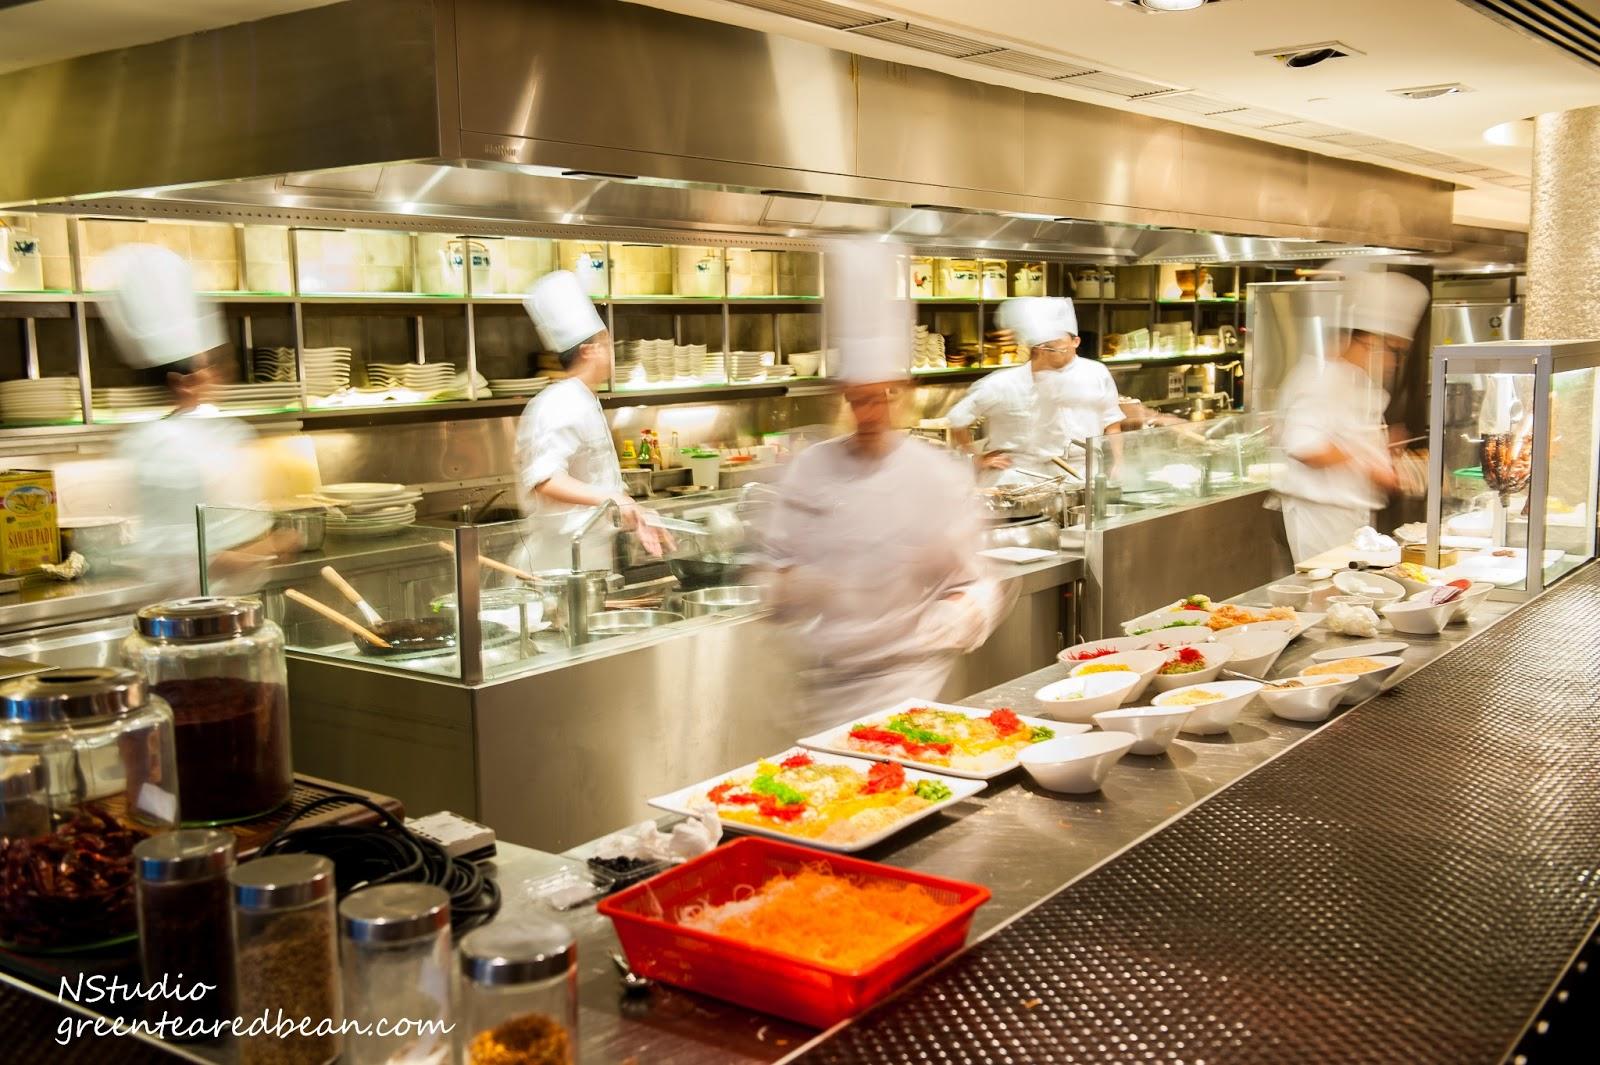 Restaurant Kitchen Wallpaper new kitchen design with restaurant kitchen | design design ideas